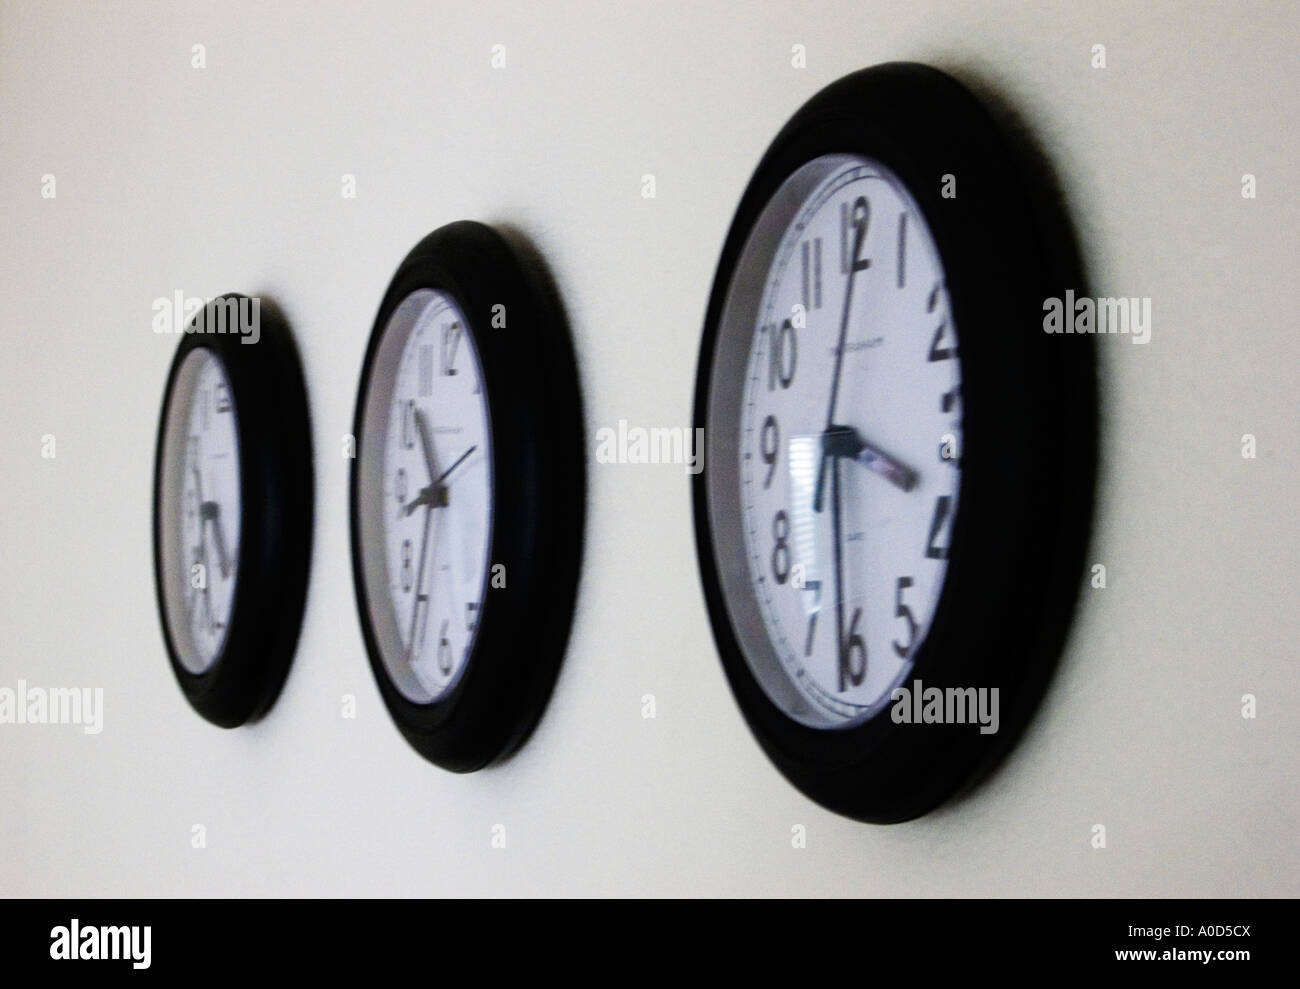 three office wall clocks set at different times stock photo  - stock photo  three office wall clocks set at different times